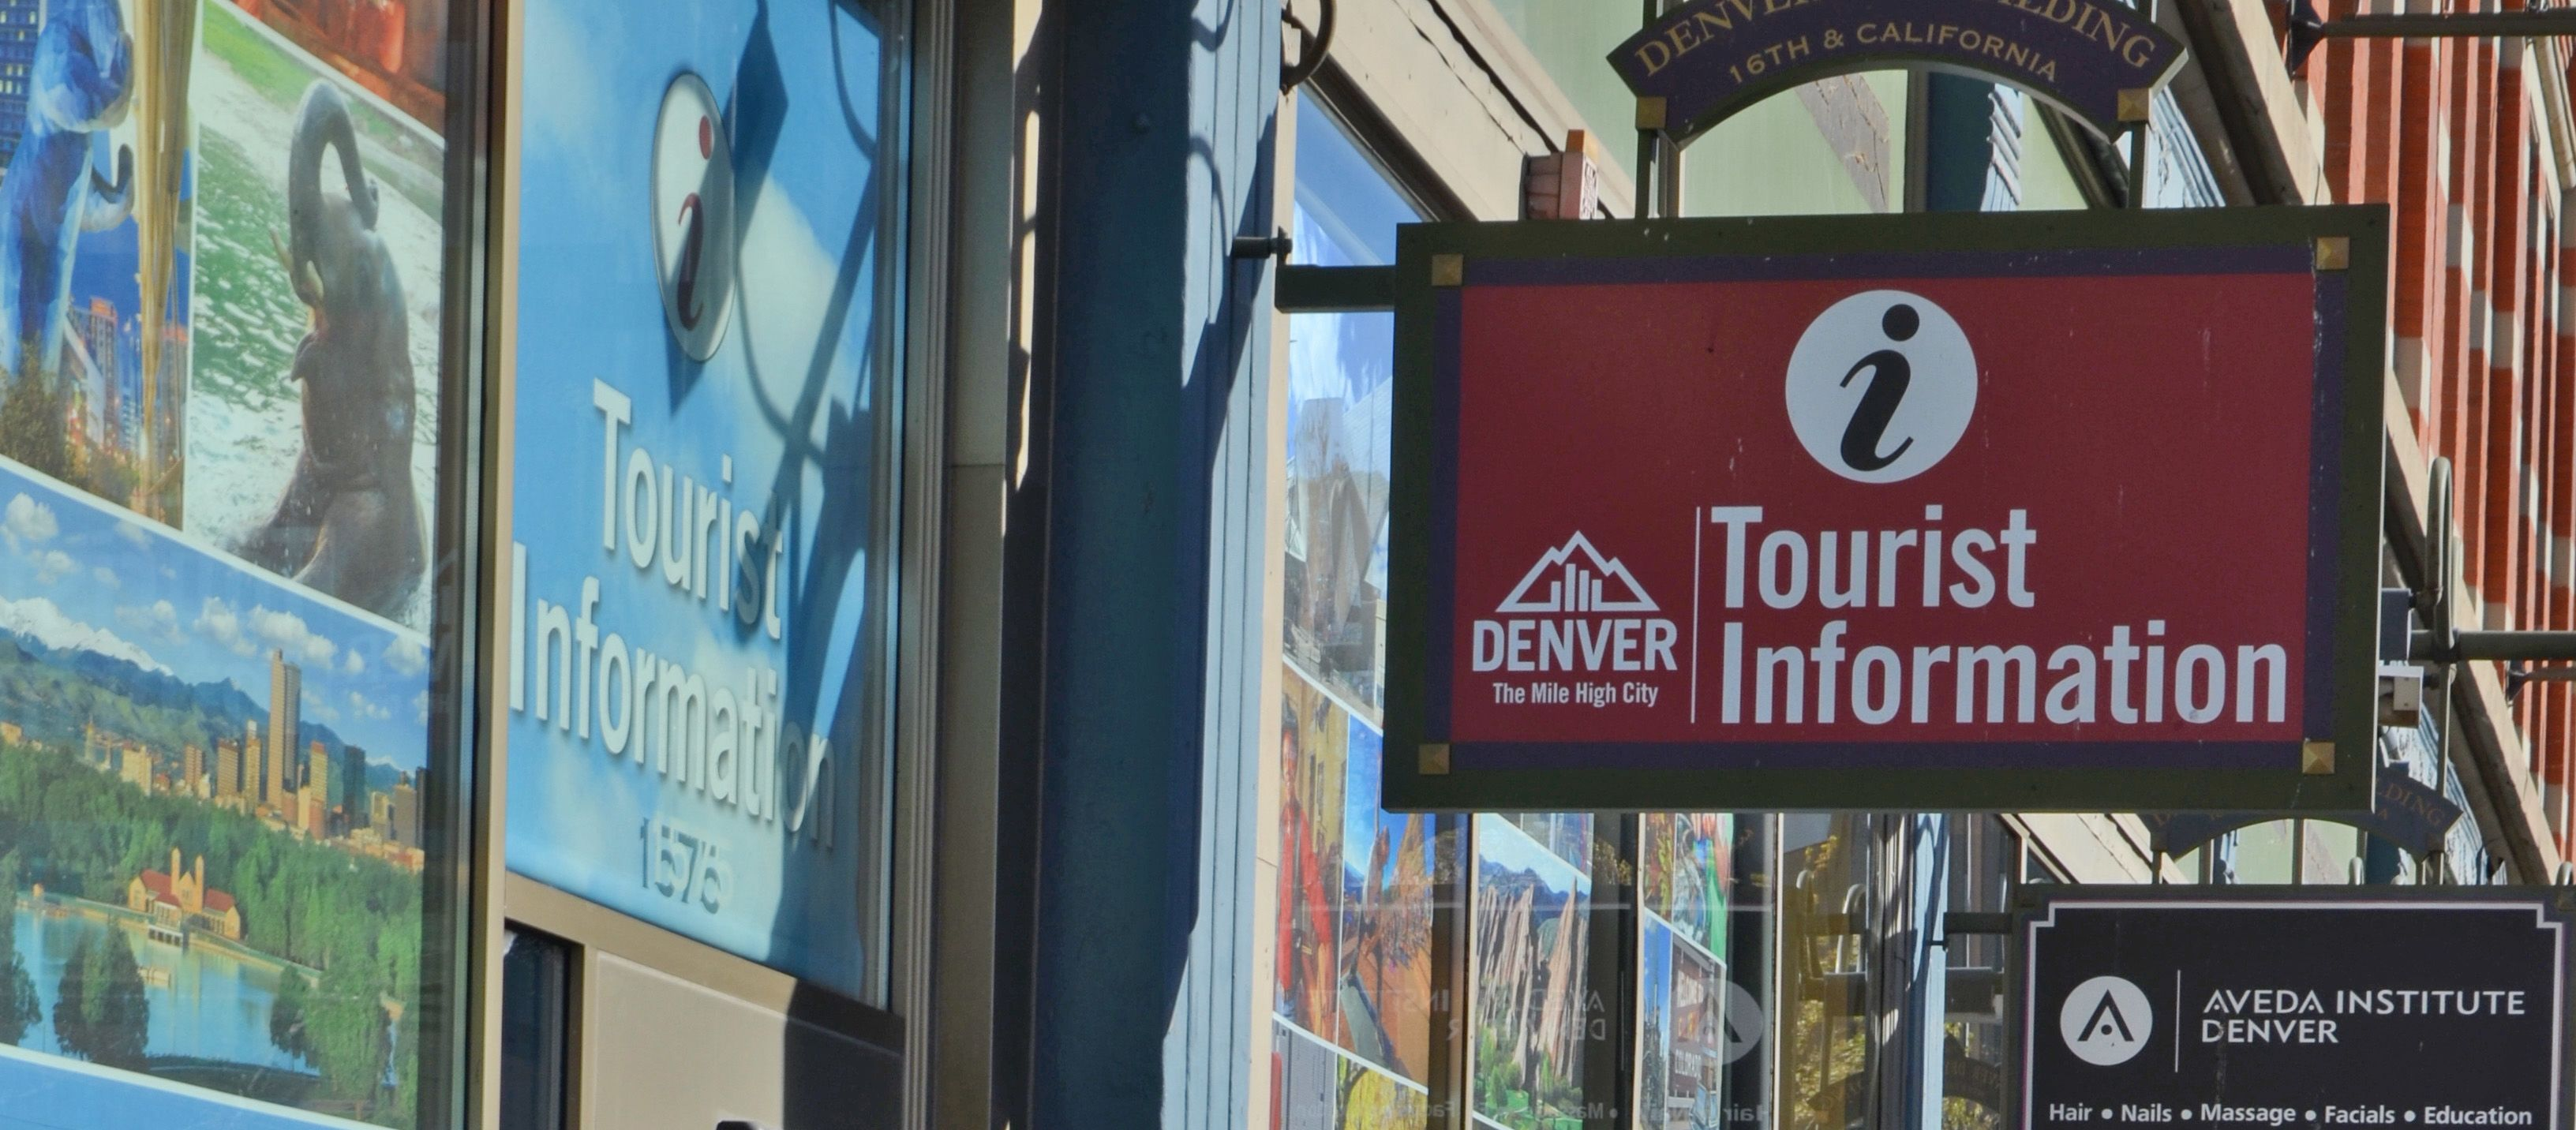 Sabrina vor dem Touristeninformationscenter in Denver, Colorado